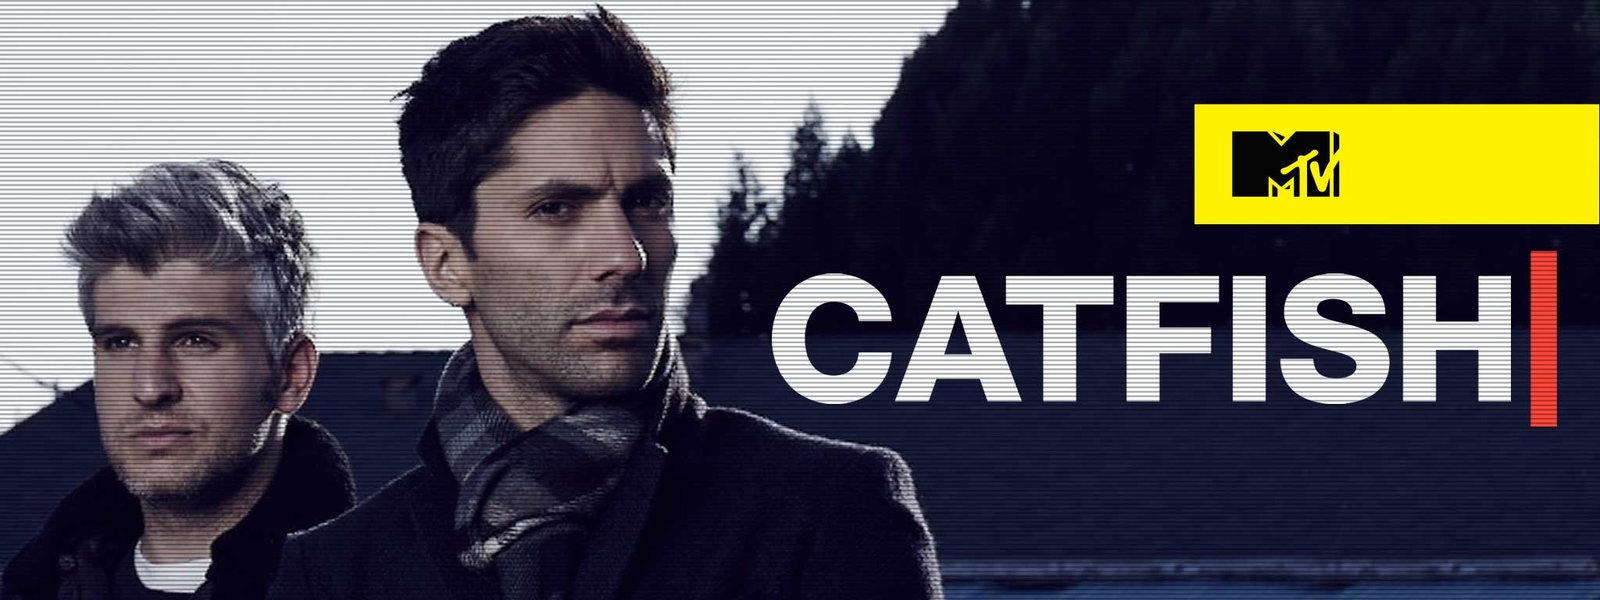 Catfish The Show Season 7 Free Online Movies Amp Tv Shows At Solarmovie